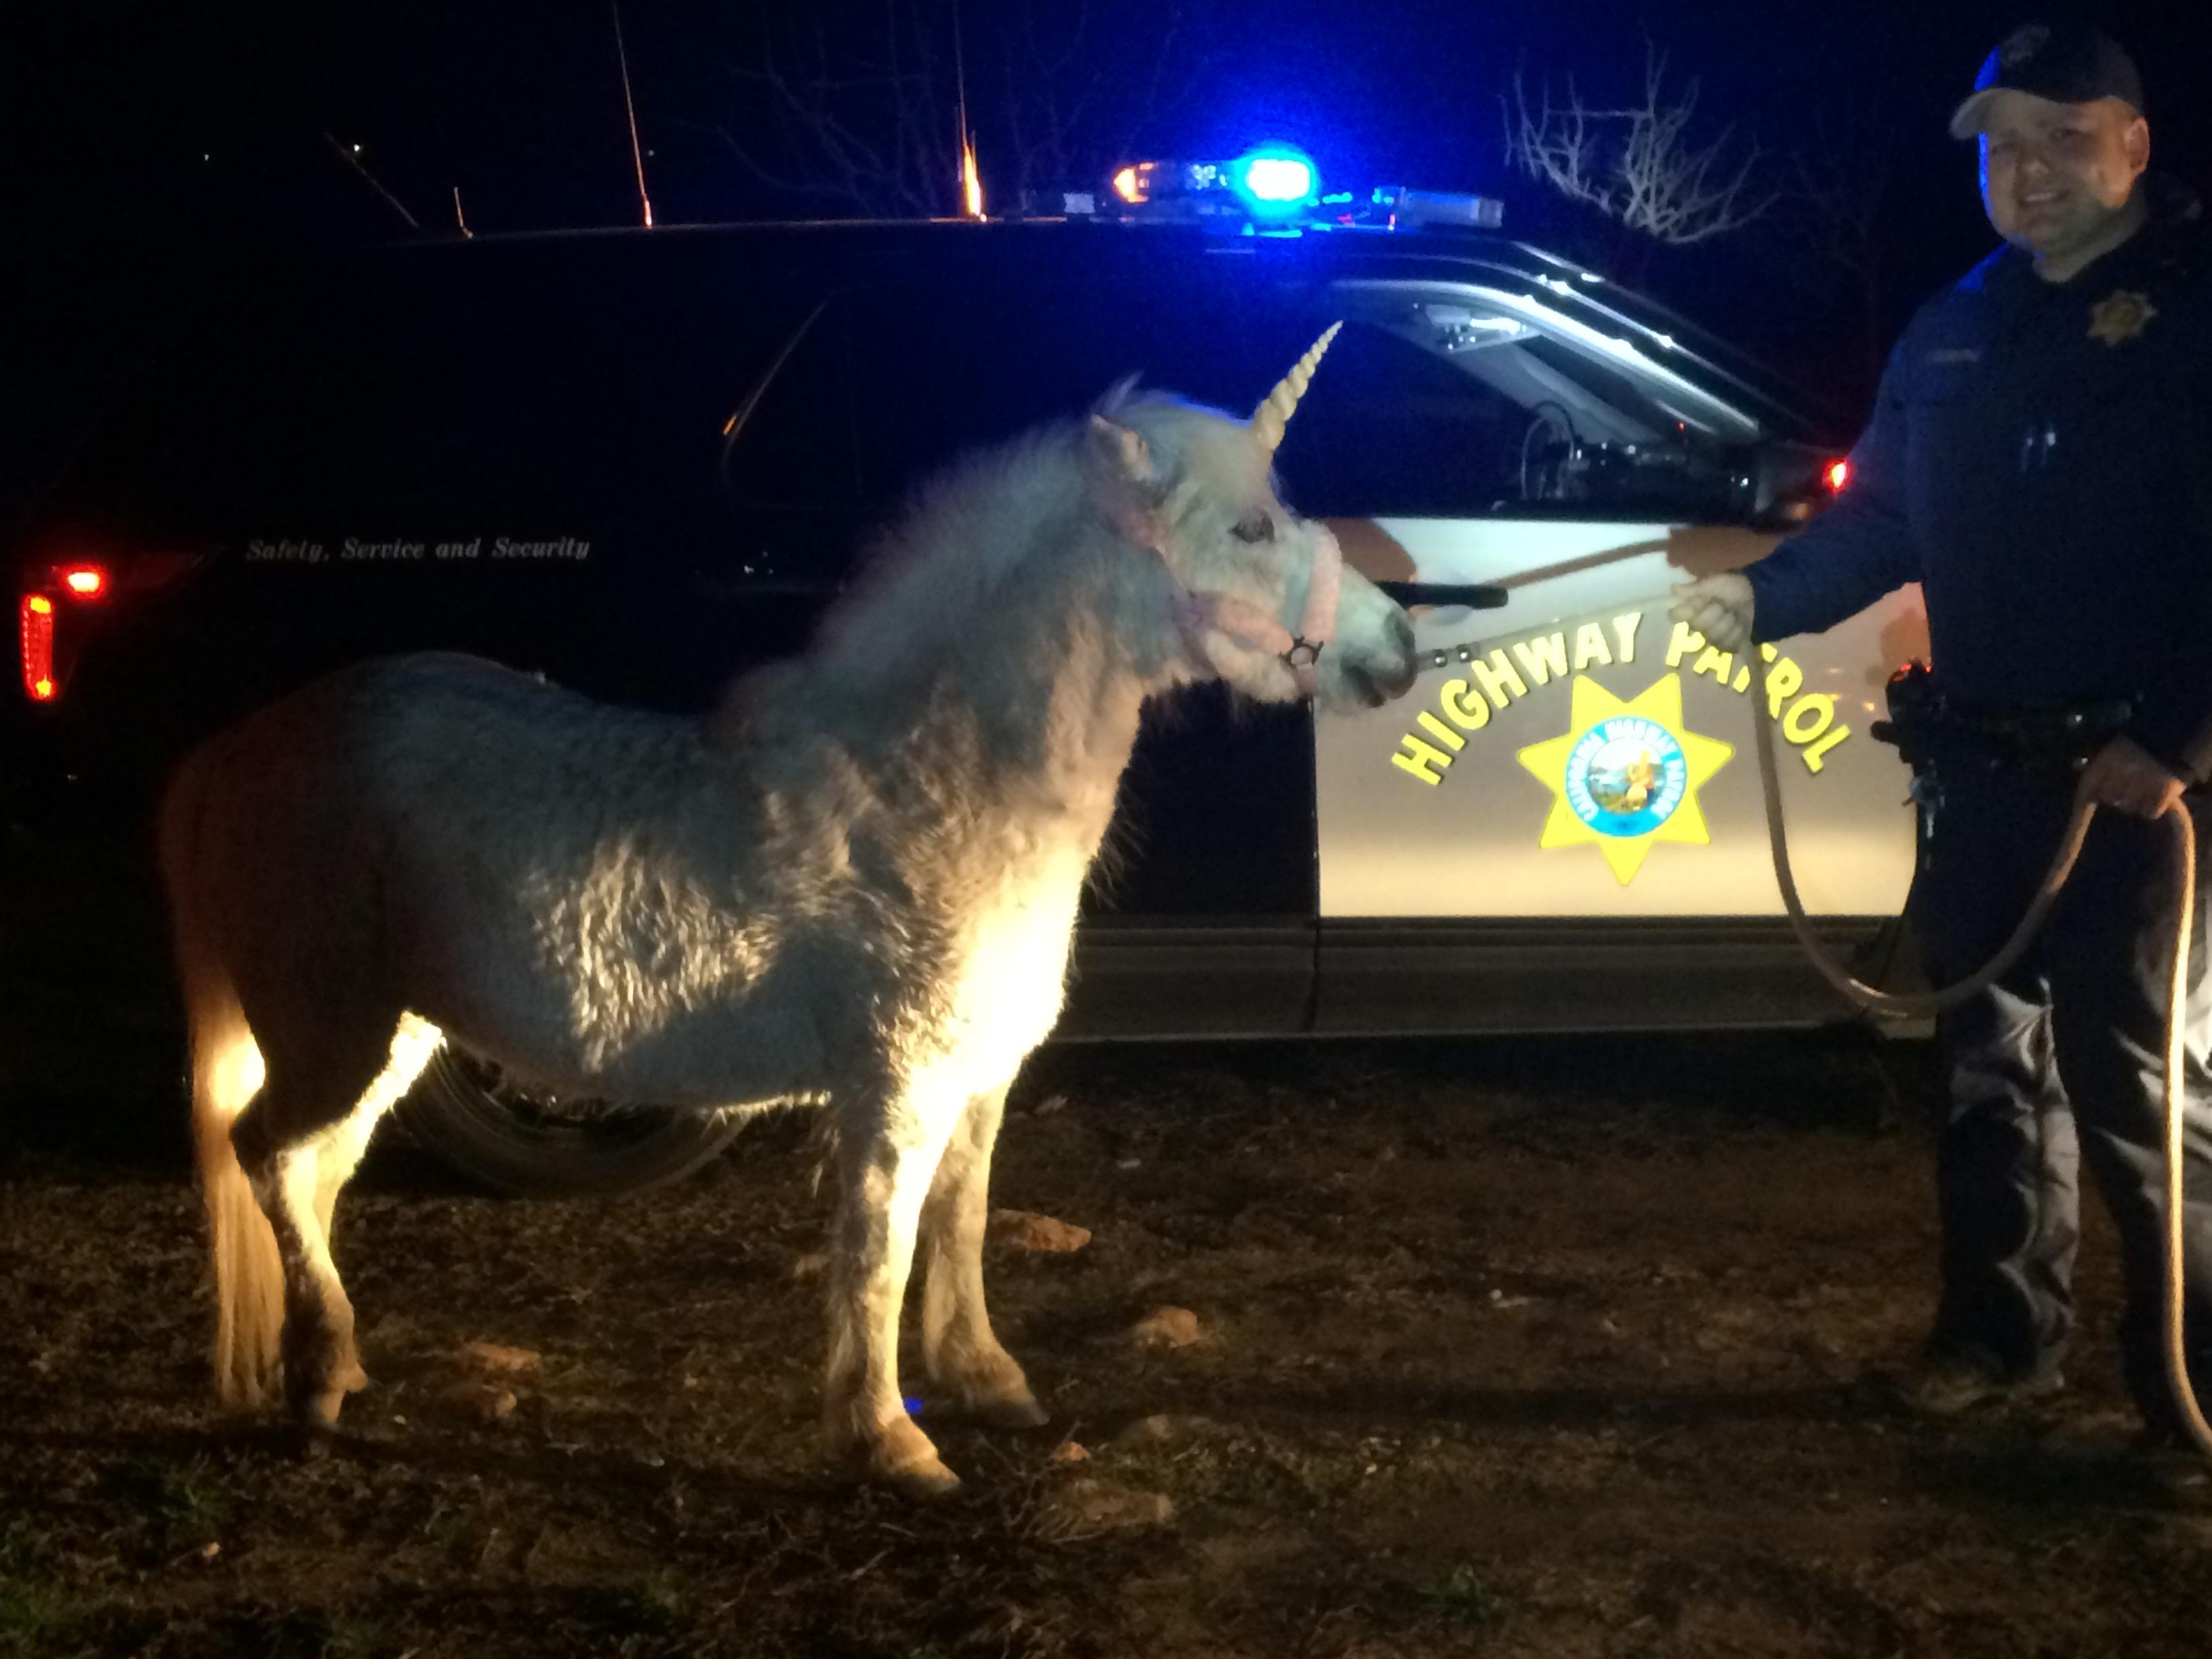 runaway unicorn u0027 prompts police chase 9news com